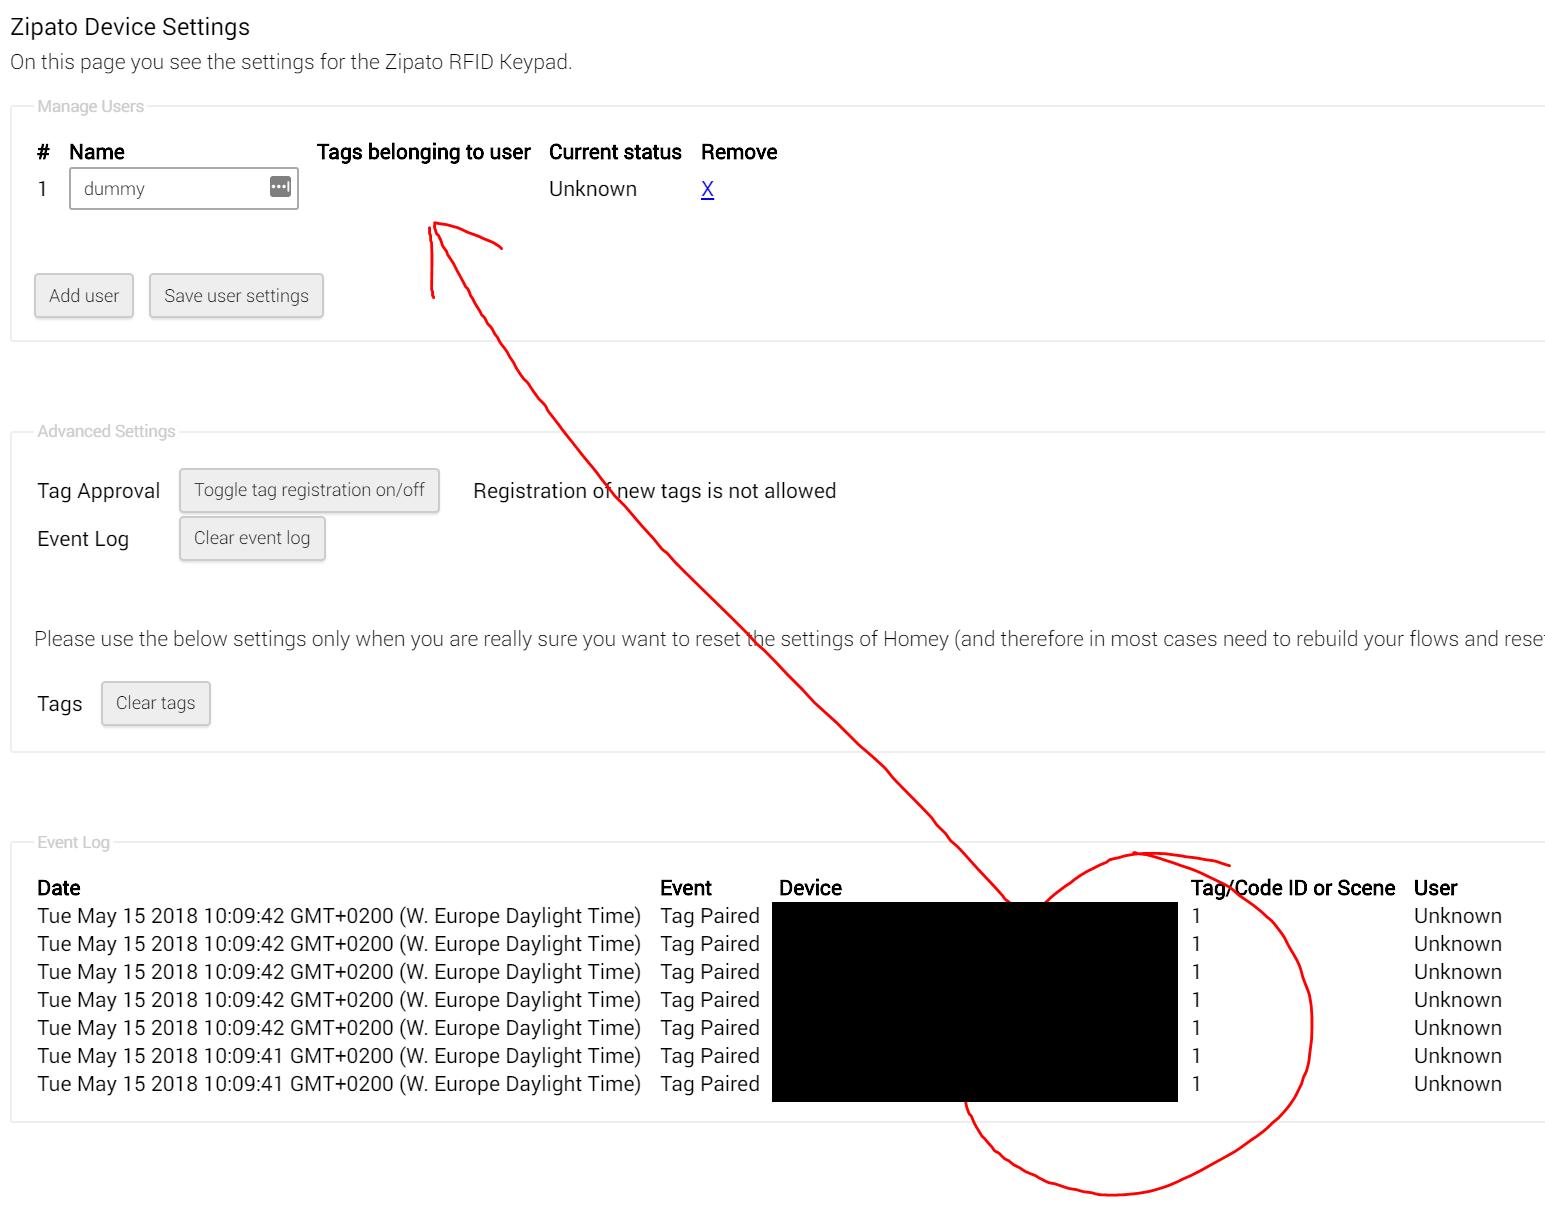 RFID keypad not supported · Issue #12 · aartse/athom zipato